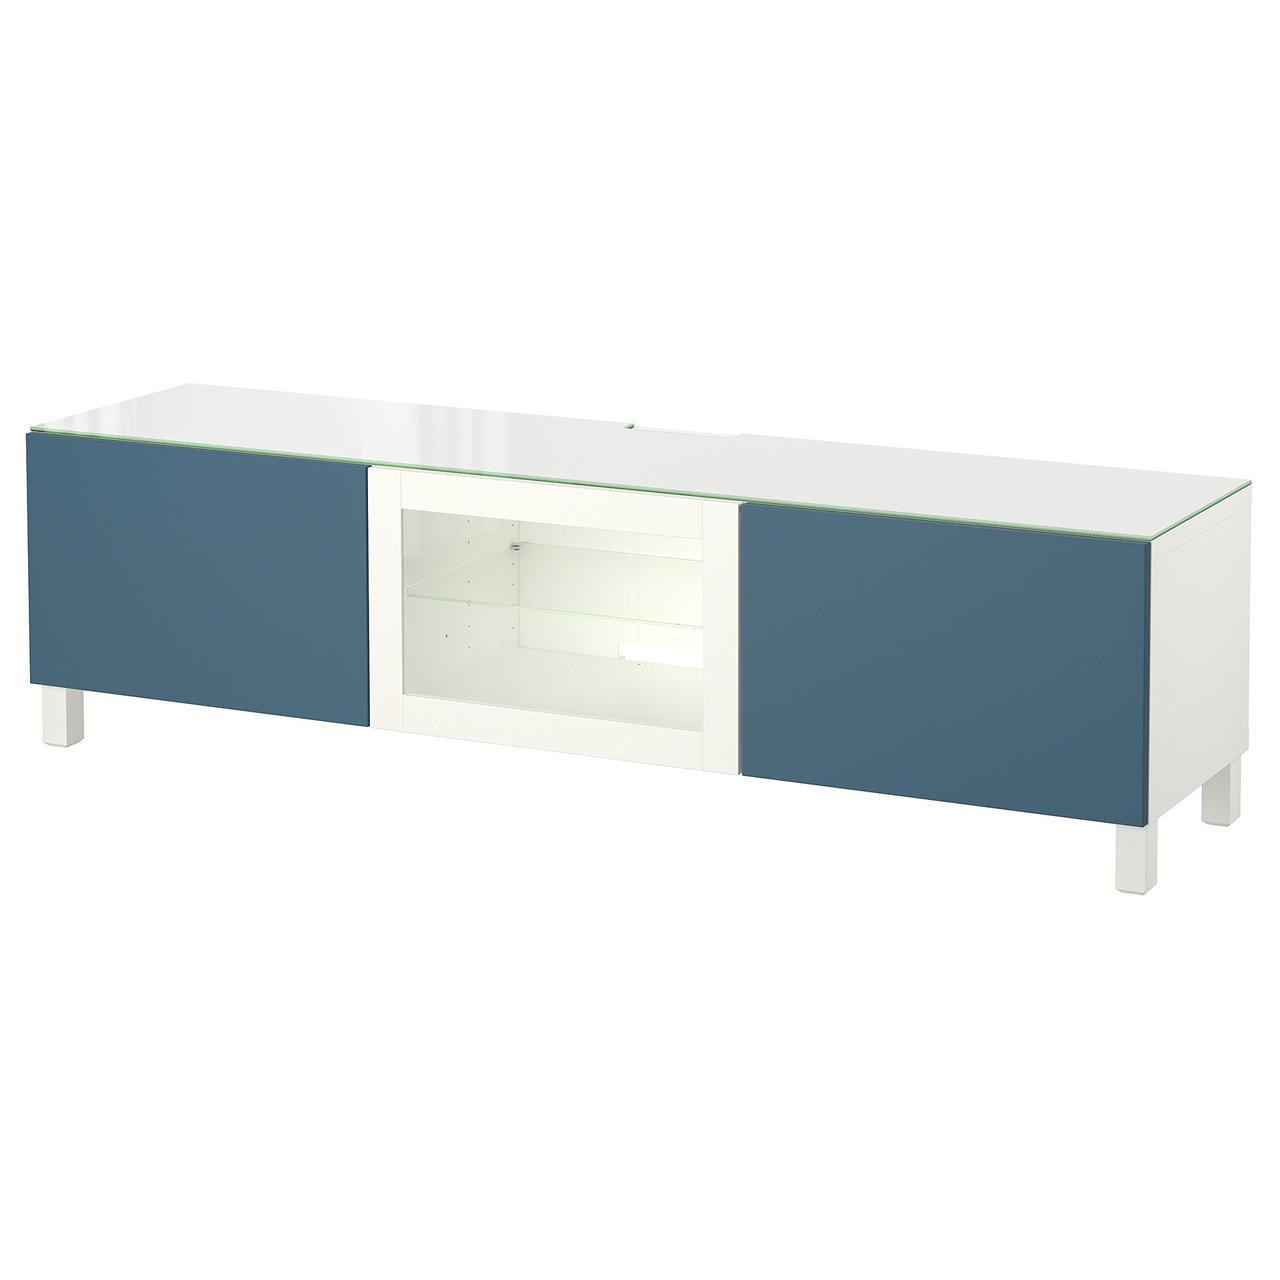 IKEA BESTA Тумба под телевизор с дверцами, белый Вальвикен, темно-синее прозрачное стекло  (292.088.77)